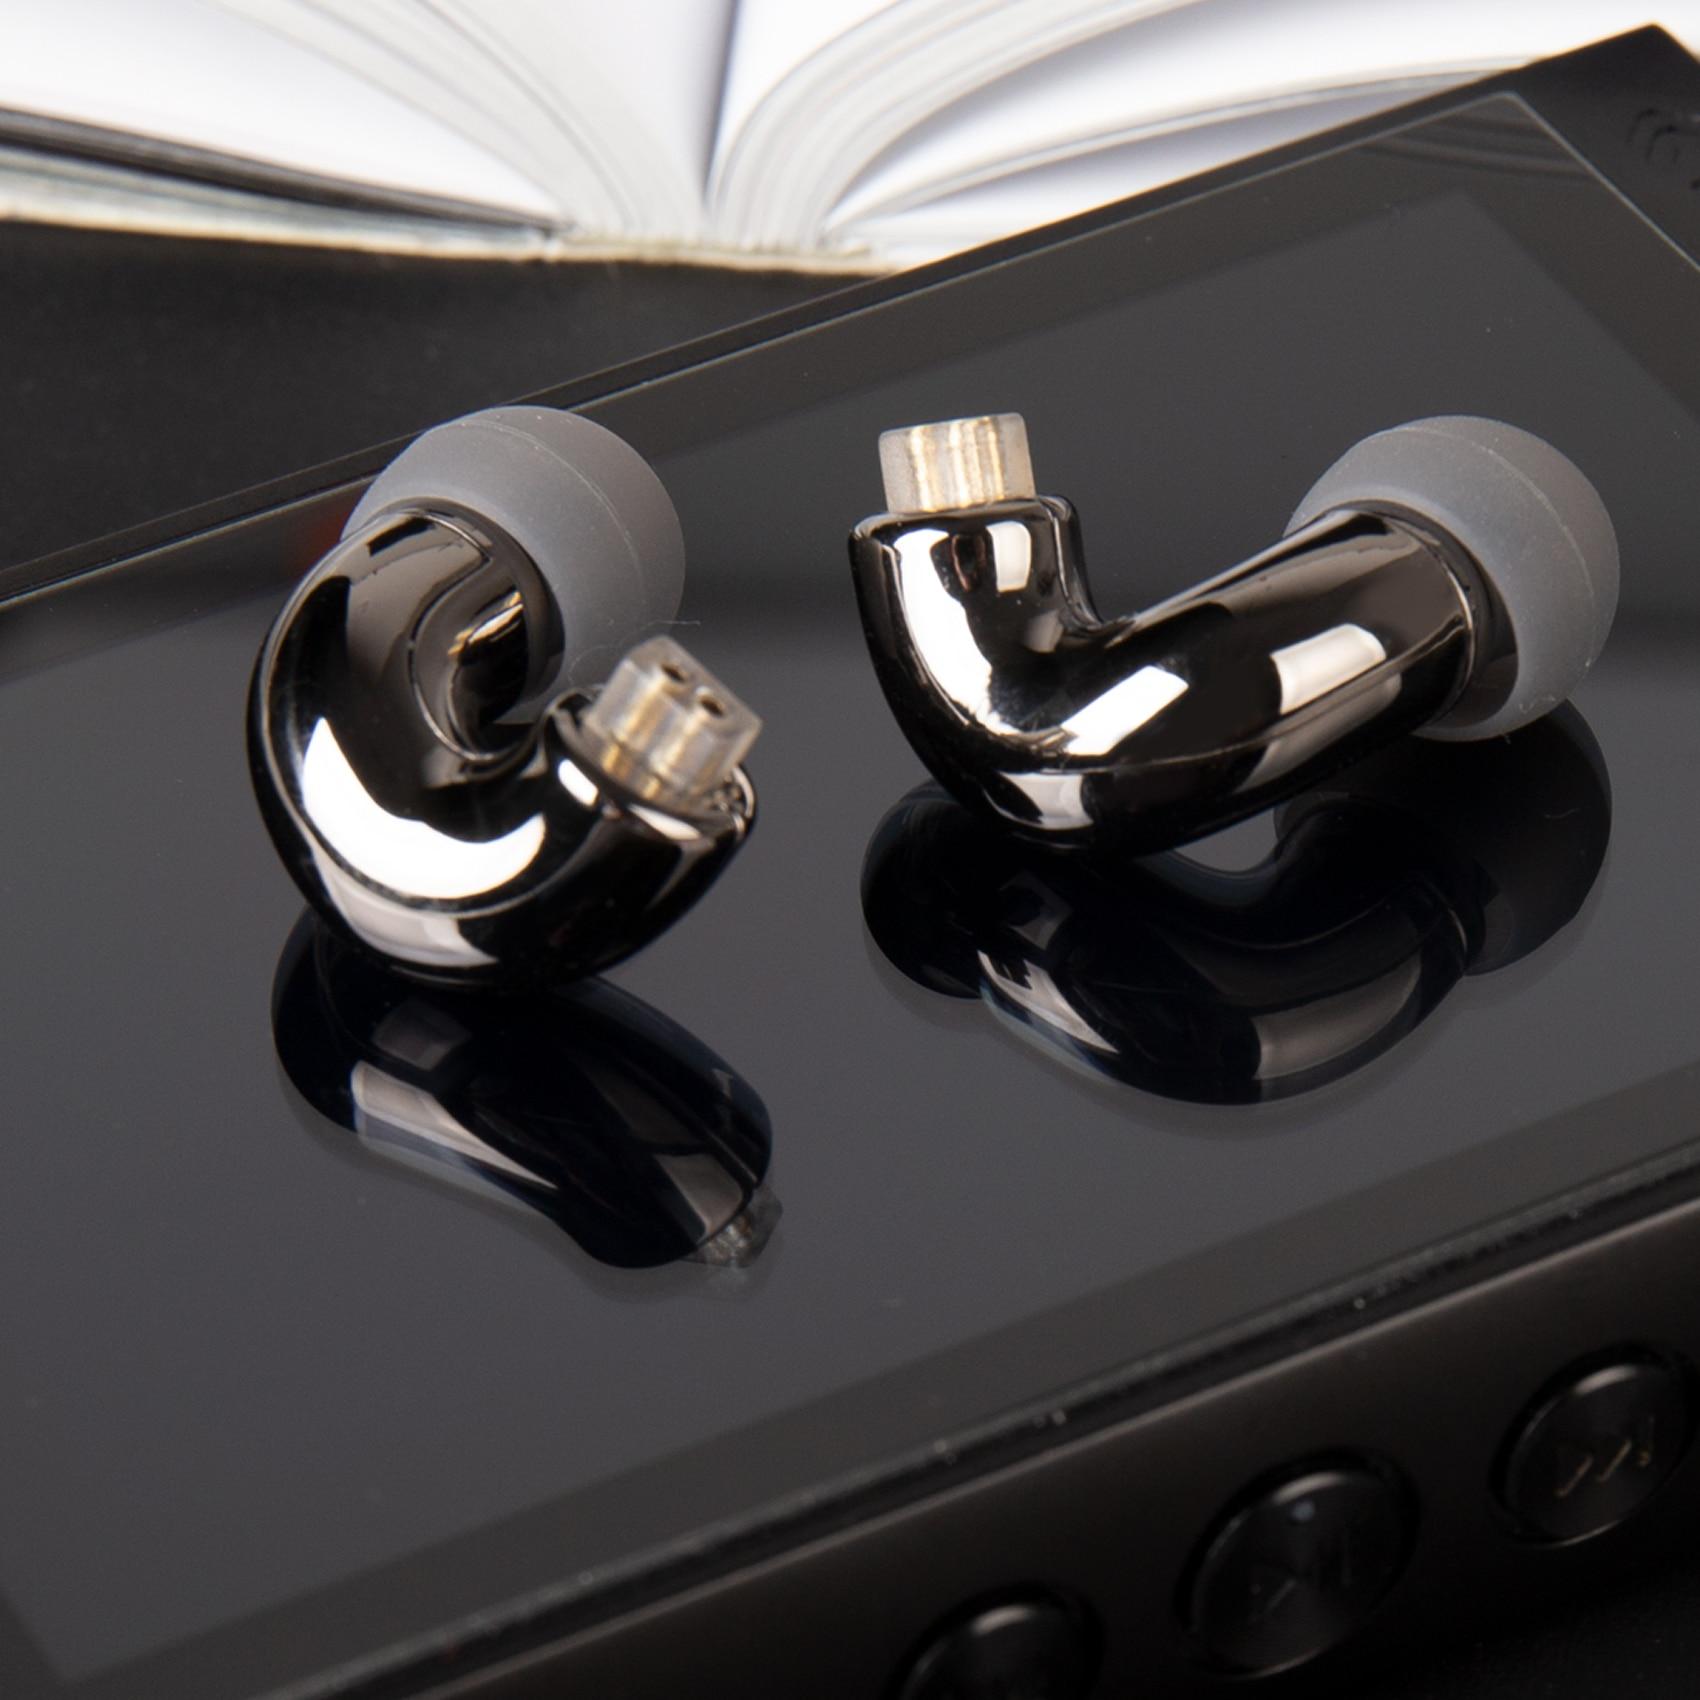 Ampli cuffie portatili senza Dac e/o IEM - Pagina 10 BLON-BL-mini-6mm-Dynamic-Driver-In-Ear-Earphone-IEM-DJ-Running-Headphones-Earbuds-2Pin-Connector